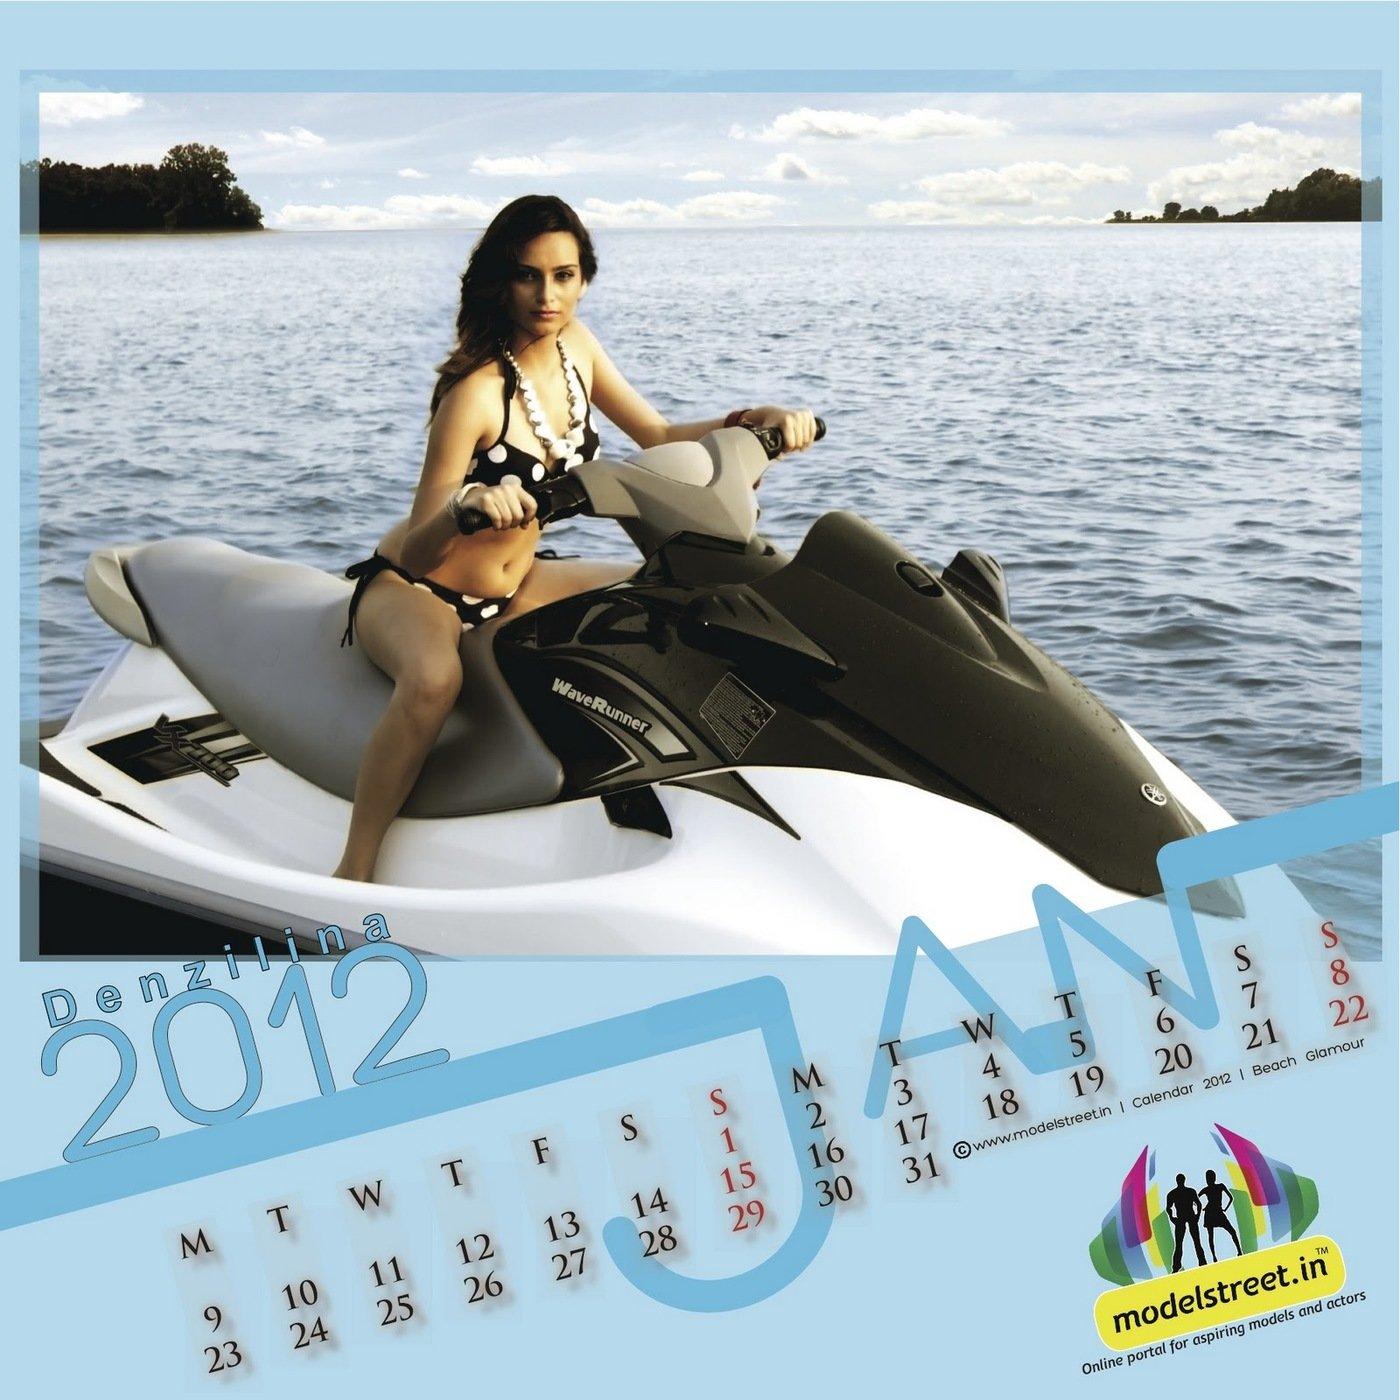 Mtv chanel bikini calendar — img 11